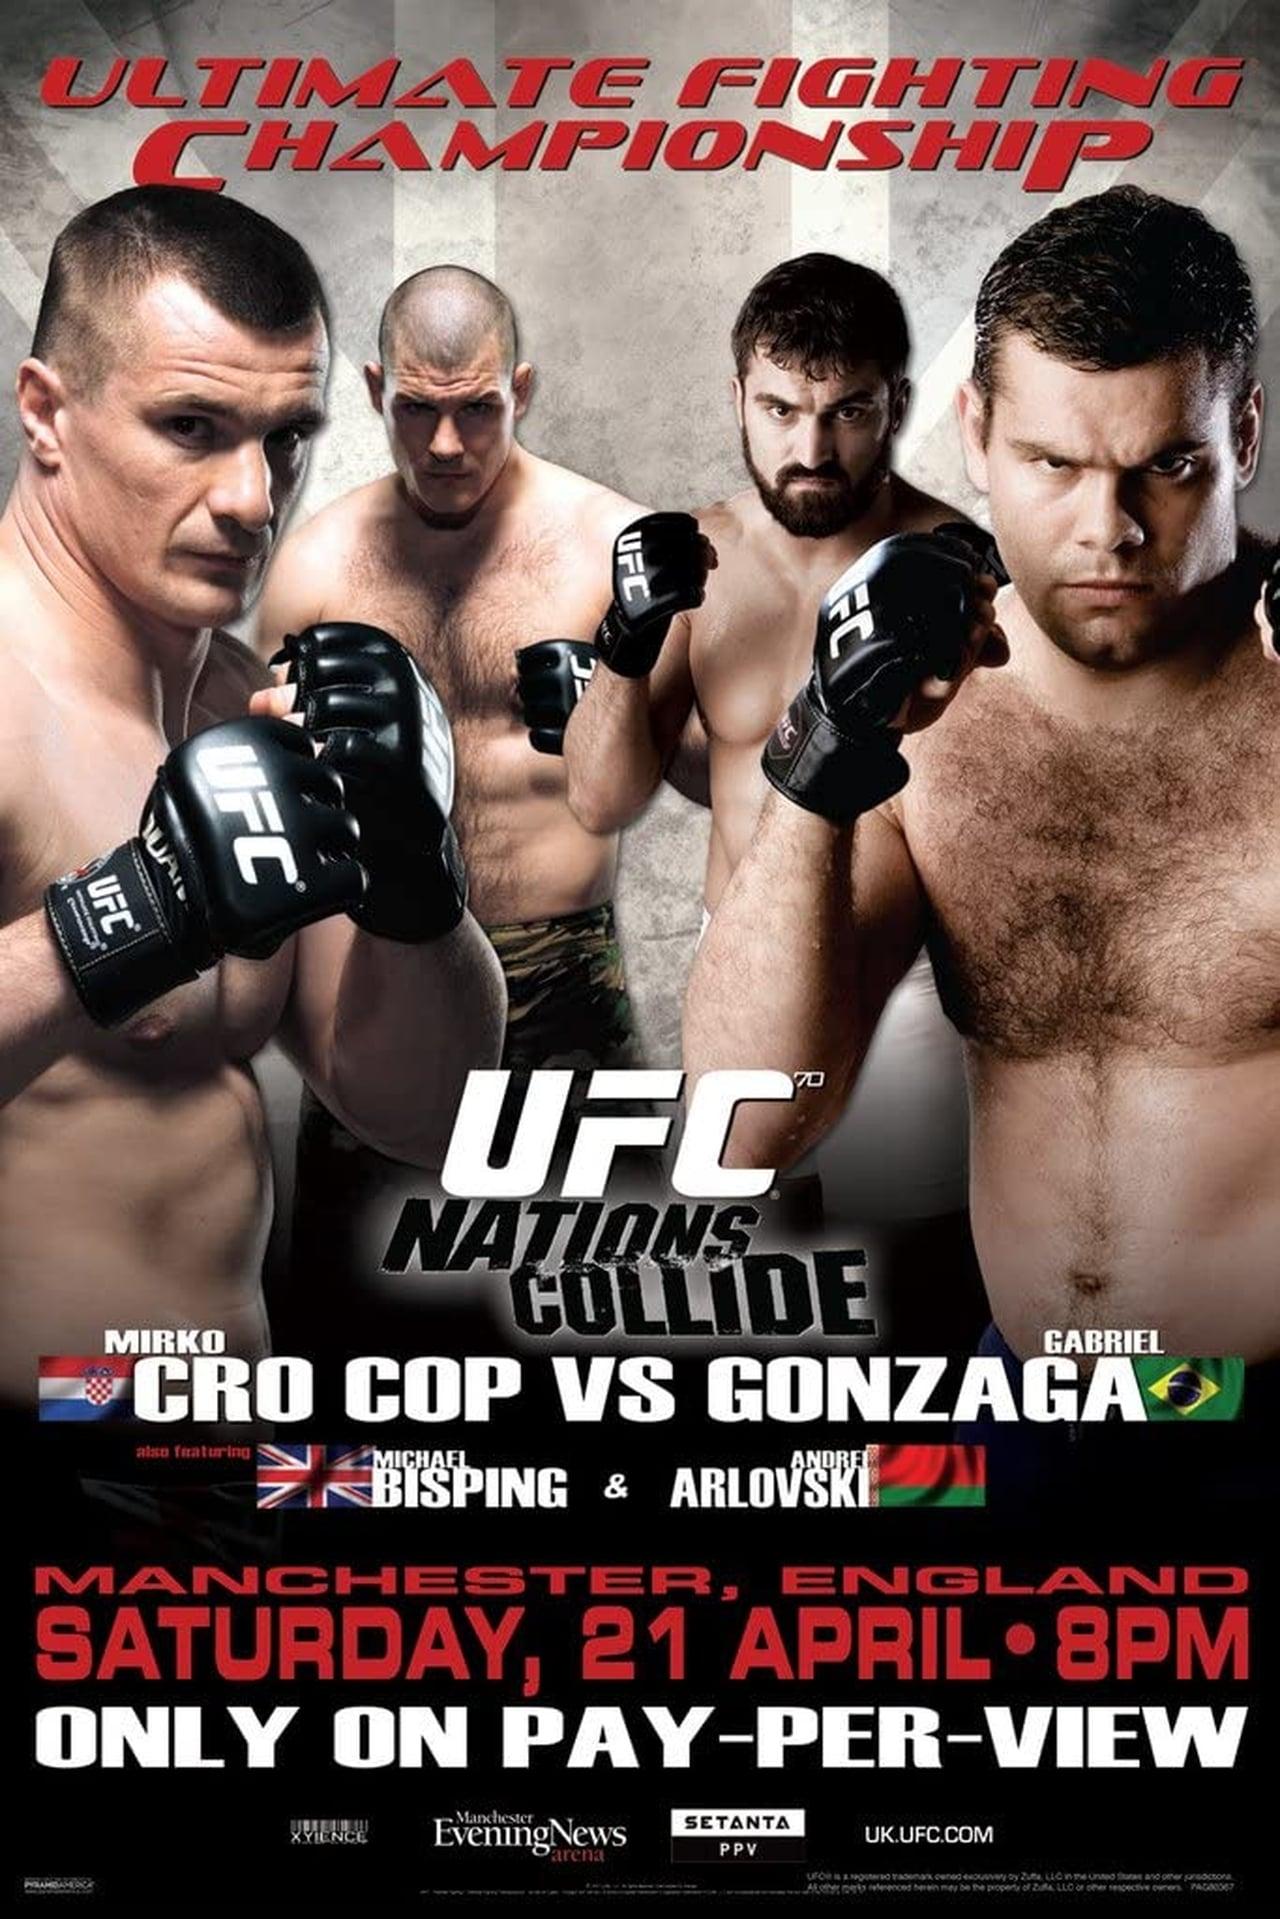 UFC 70: Nations Collide